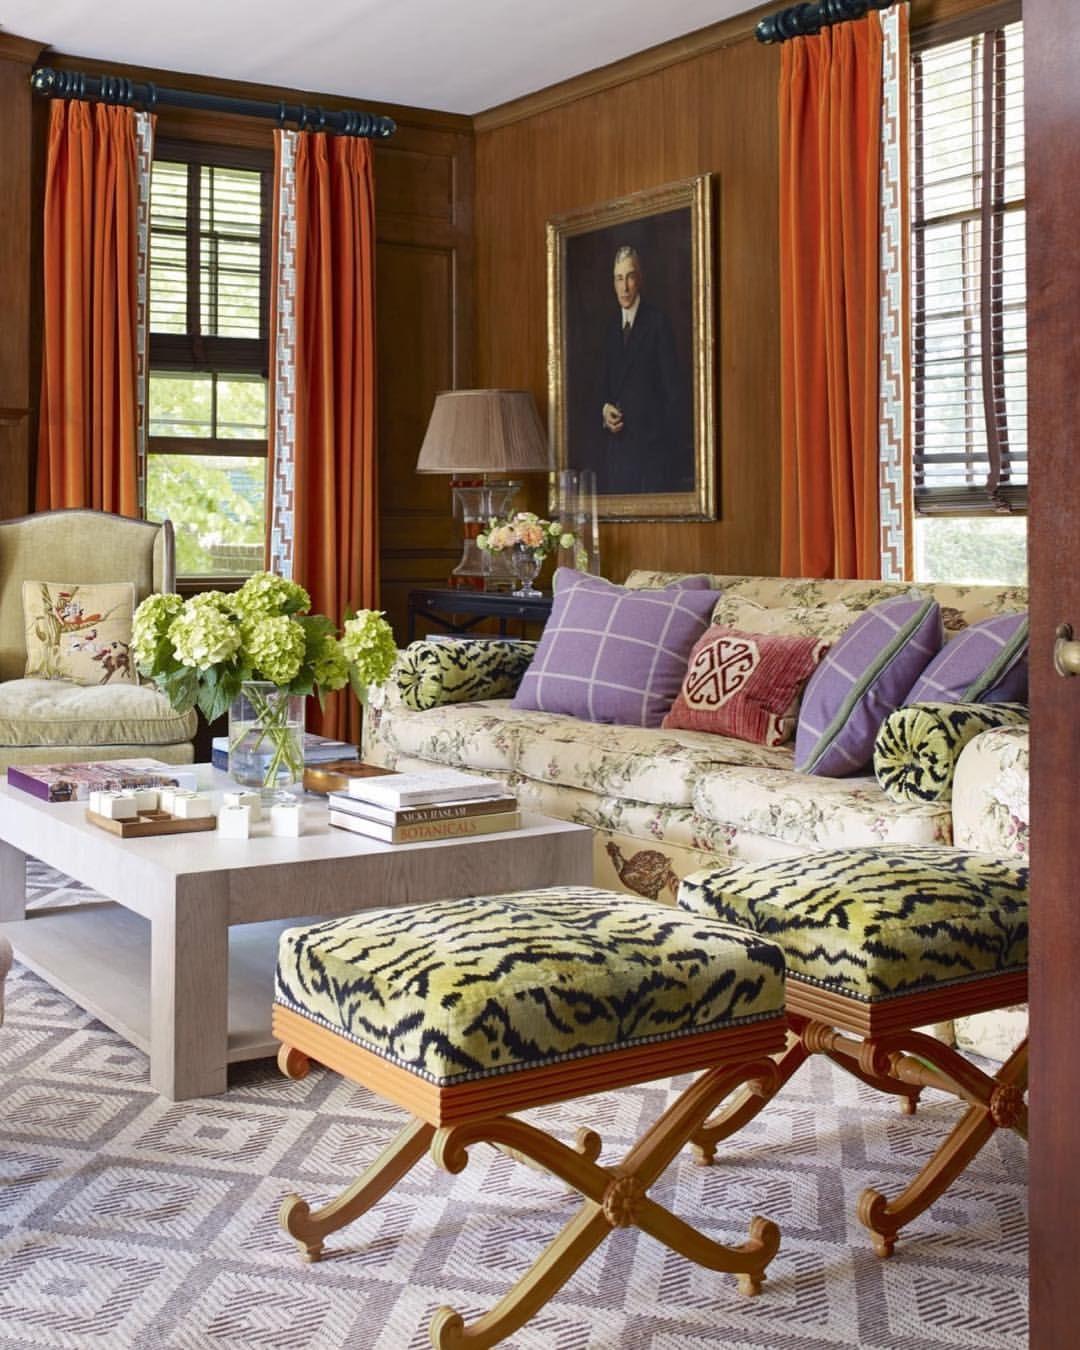 Oak Paneled Room: Southerners Have An Affinity For Oak Paneled Rooms. Half